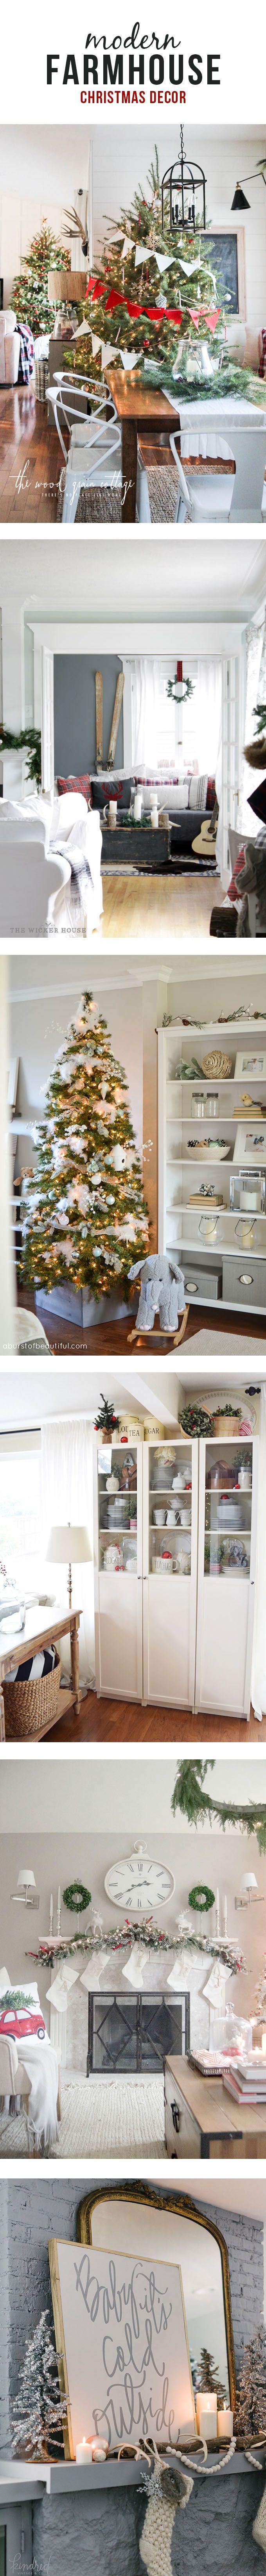 1000 ideas about modern christmas decor on pinterest modern wreath modern christmas and - Awesome the modern christmas decorations ...